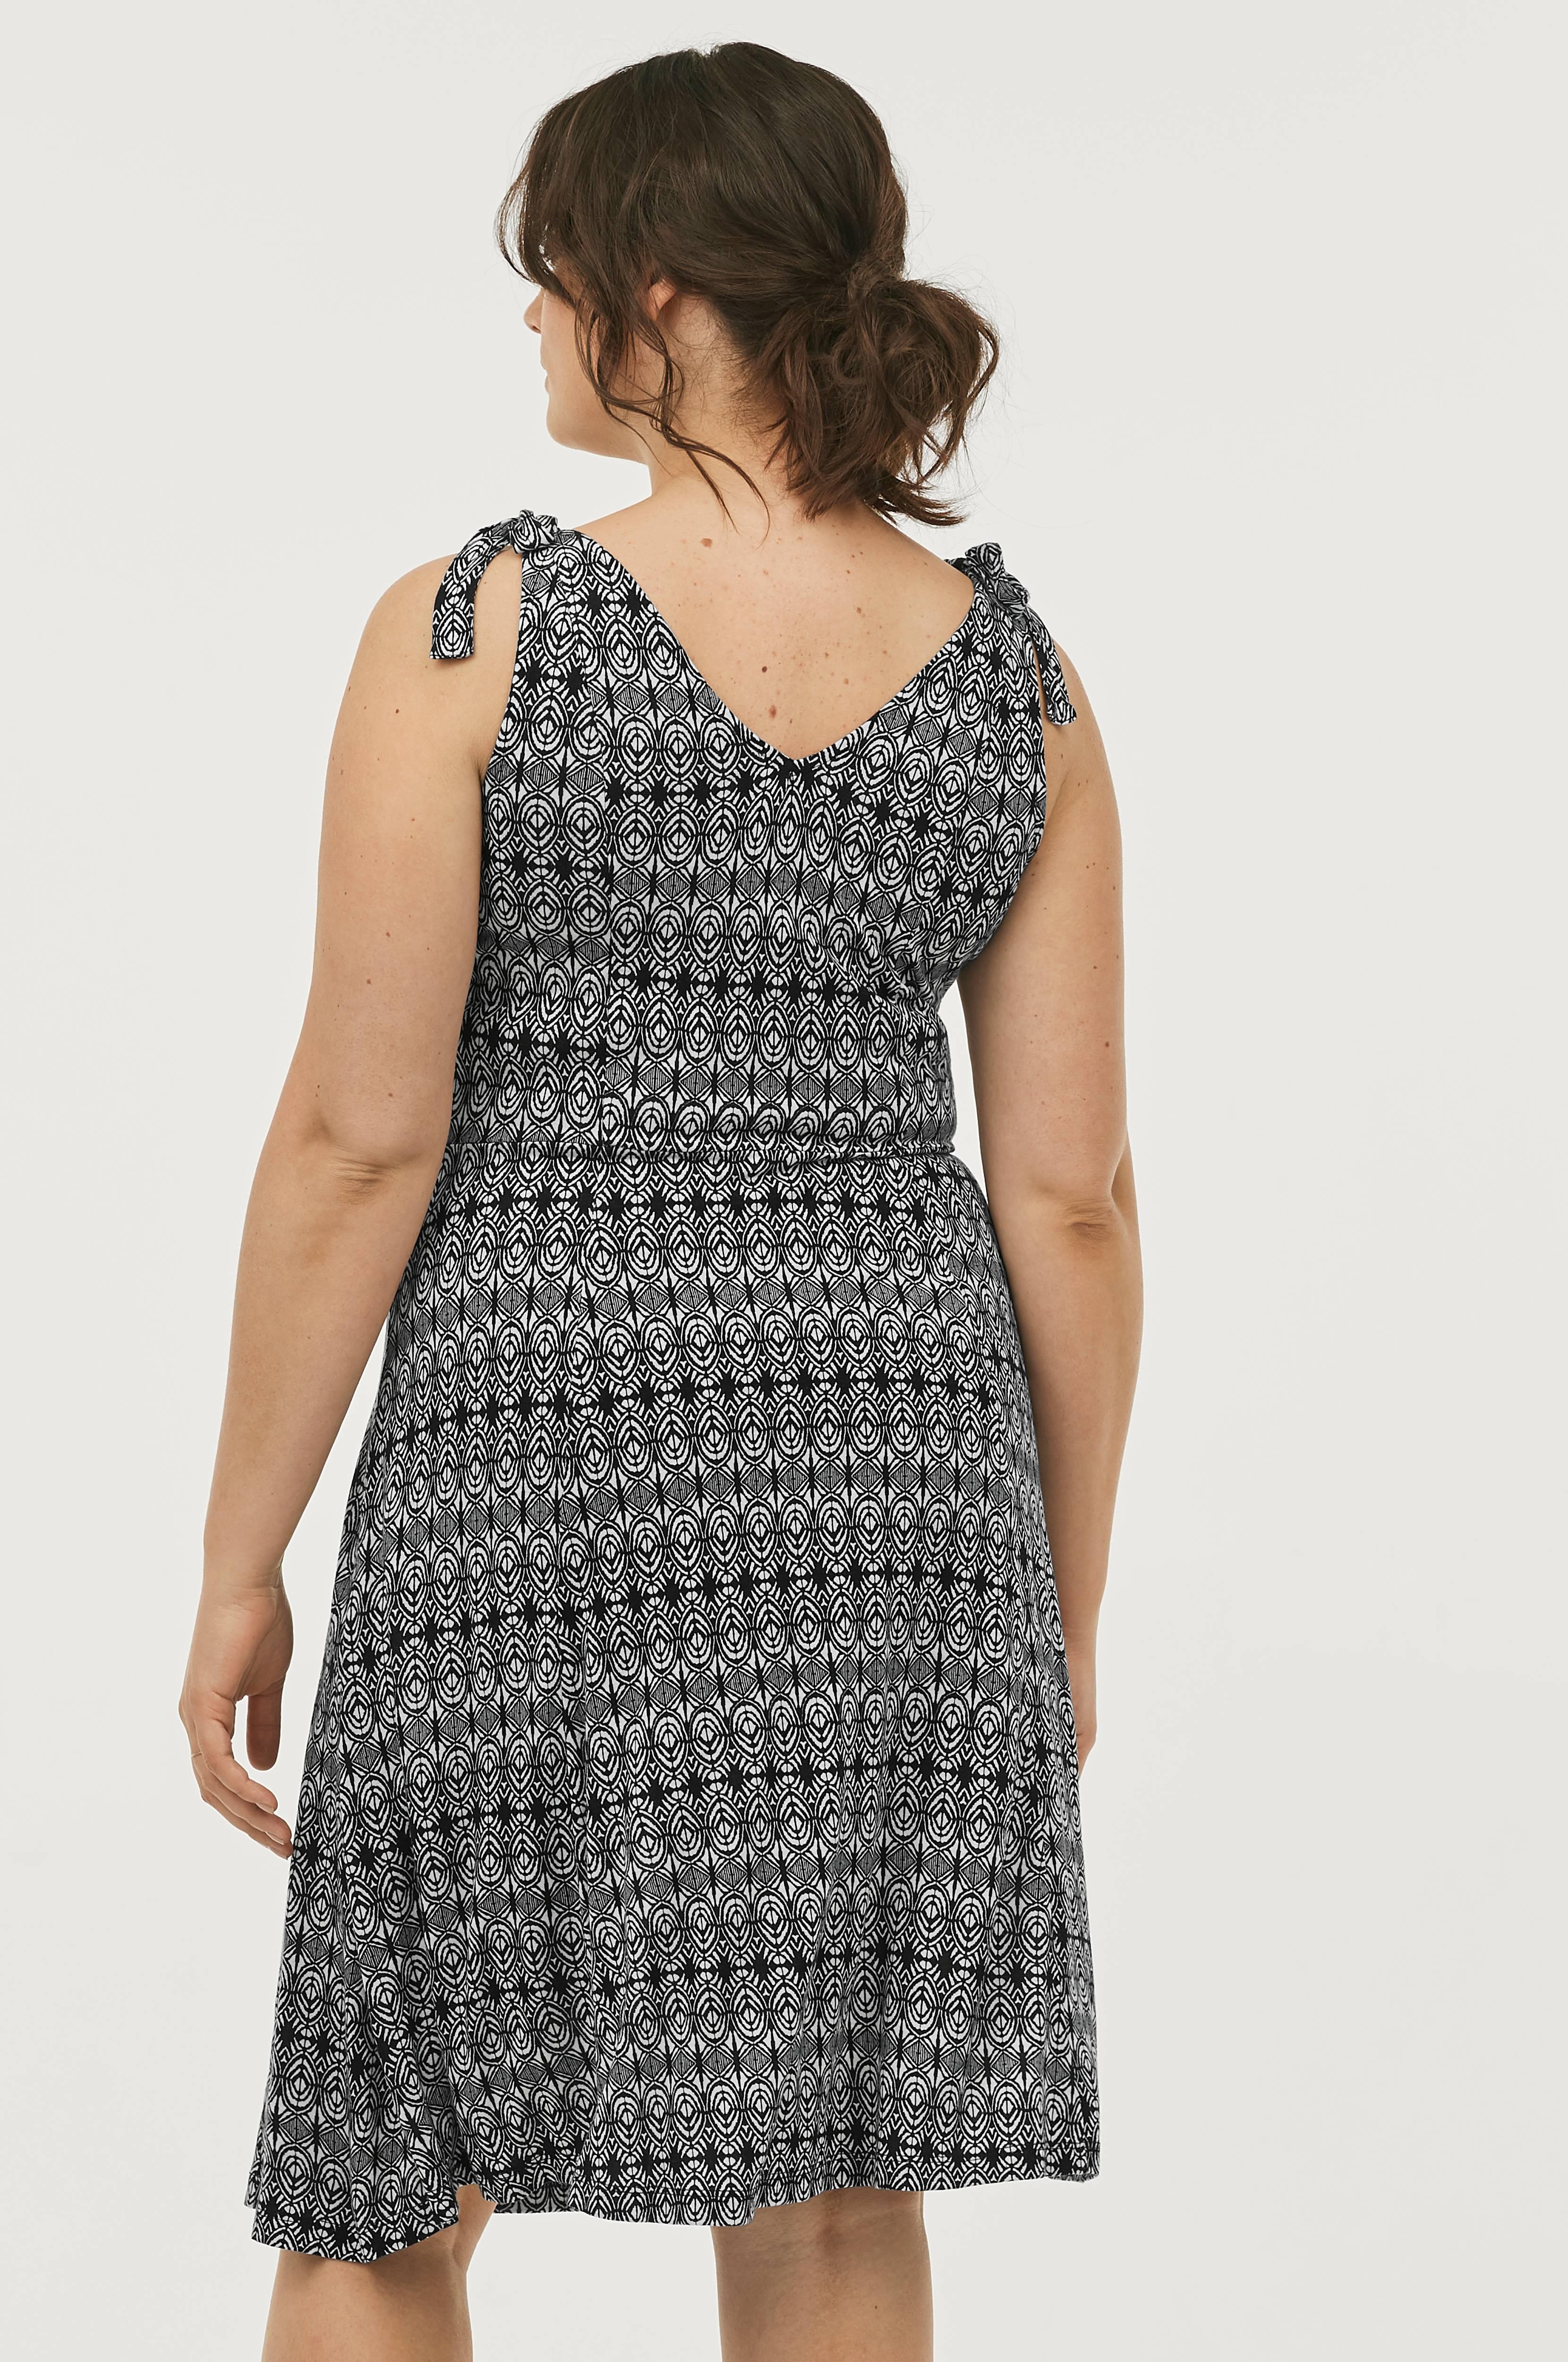 Kjole med skulderbånd som kan knytes, Black and white